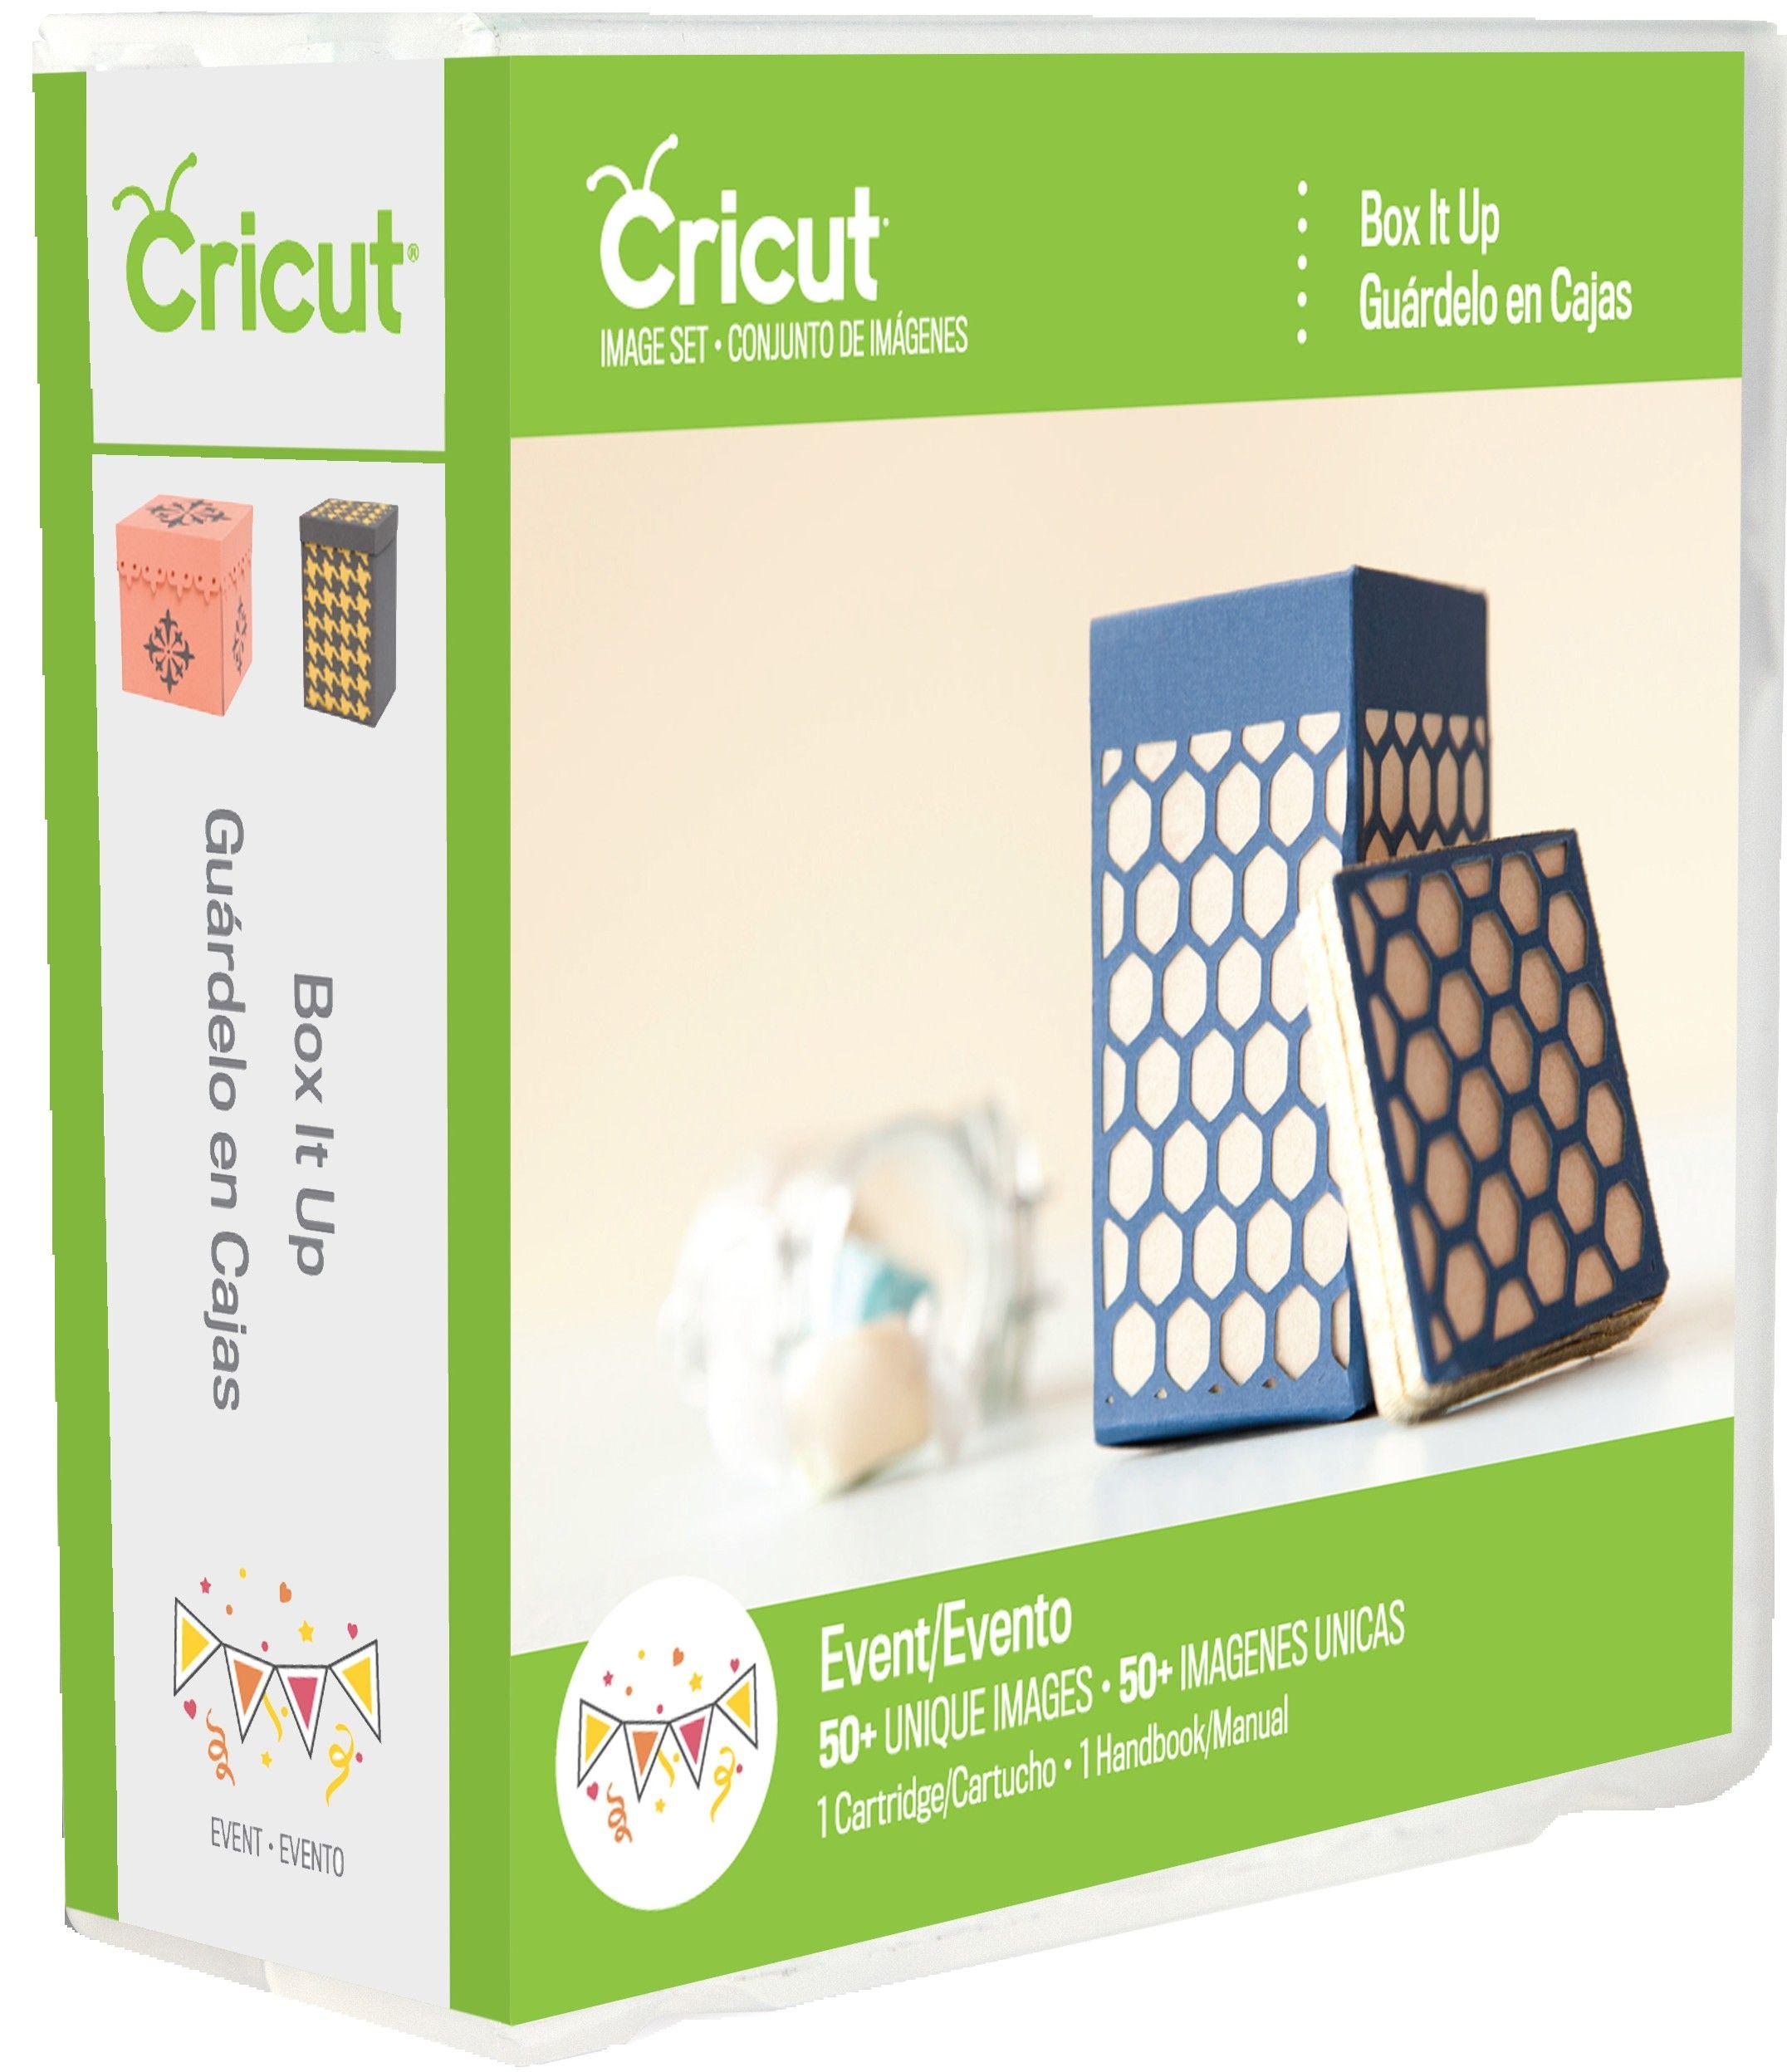 Wall Decor and More | Cheap Cricut Cartridges $9.99 and Up |New Cricut Cartridges Cheap